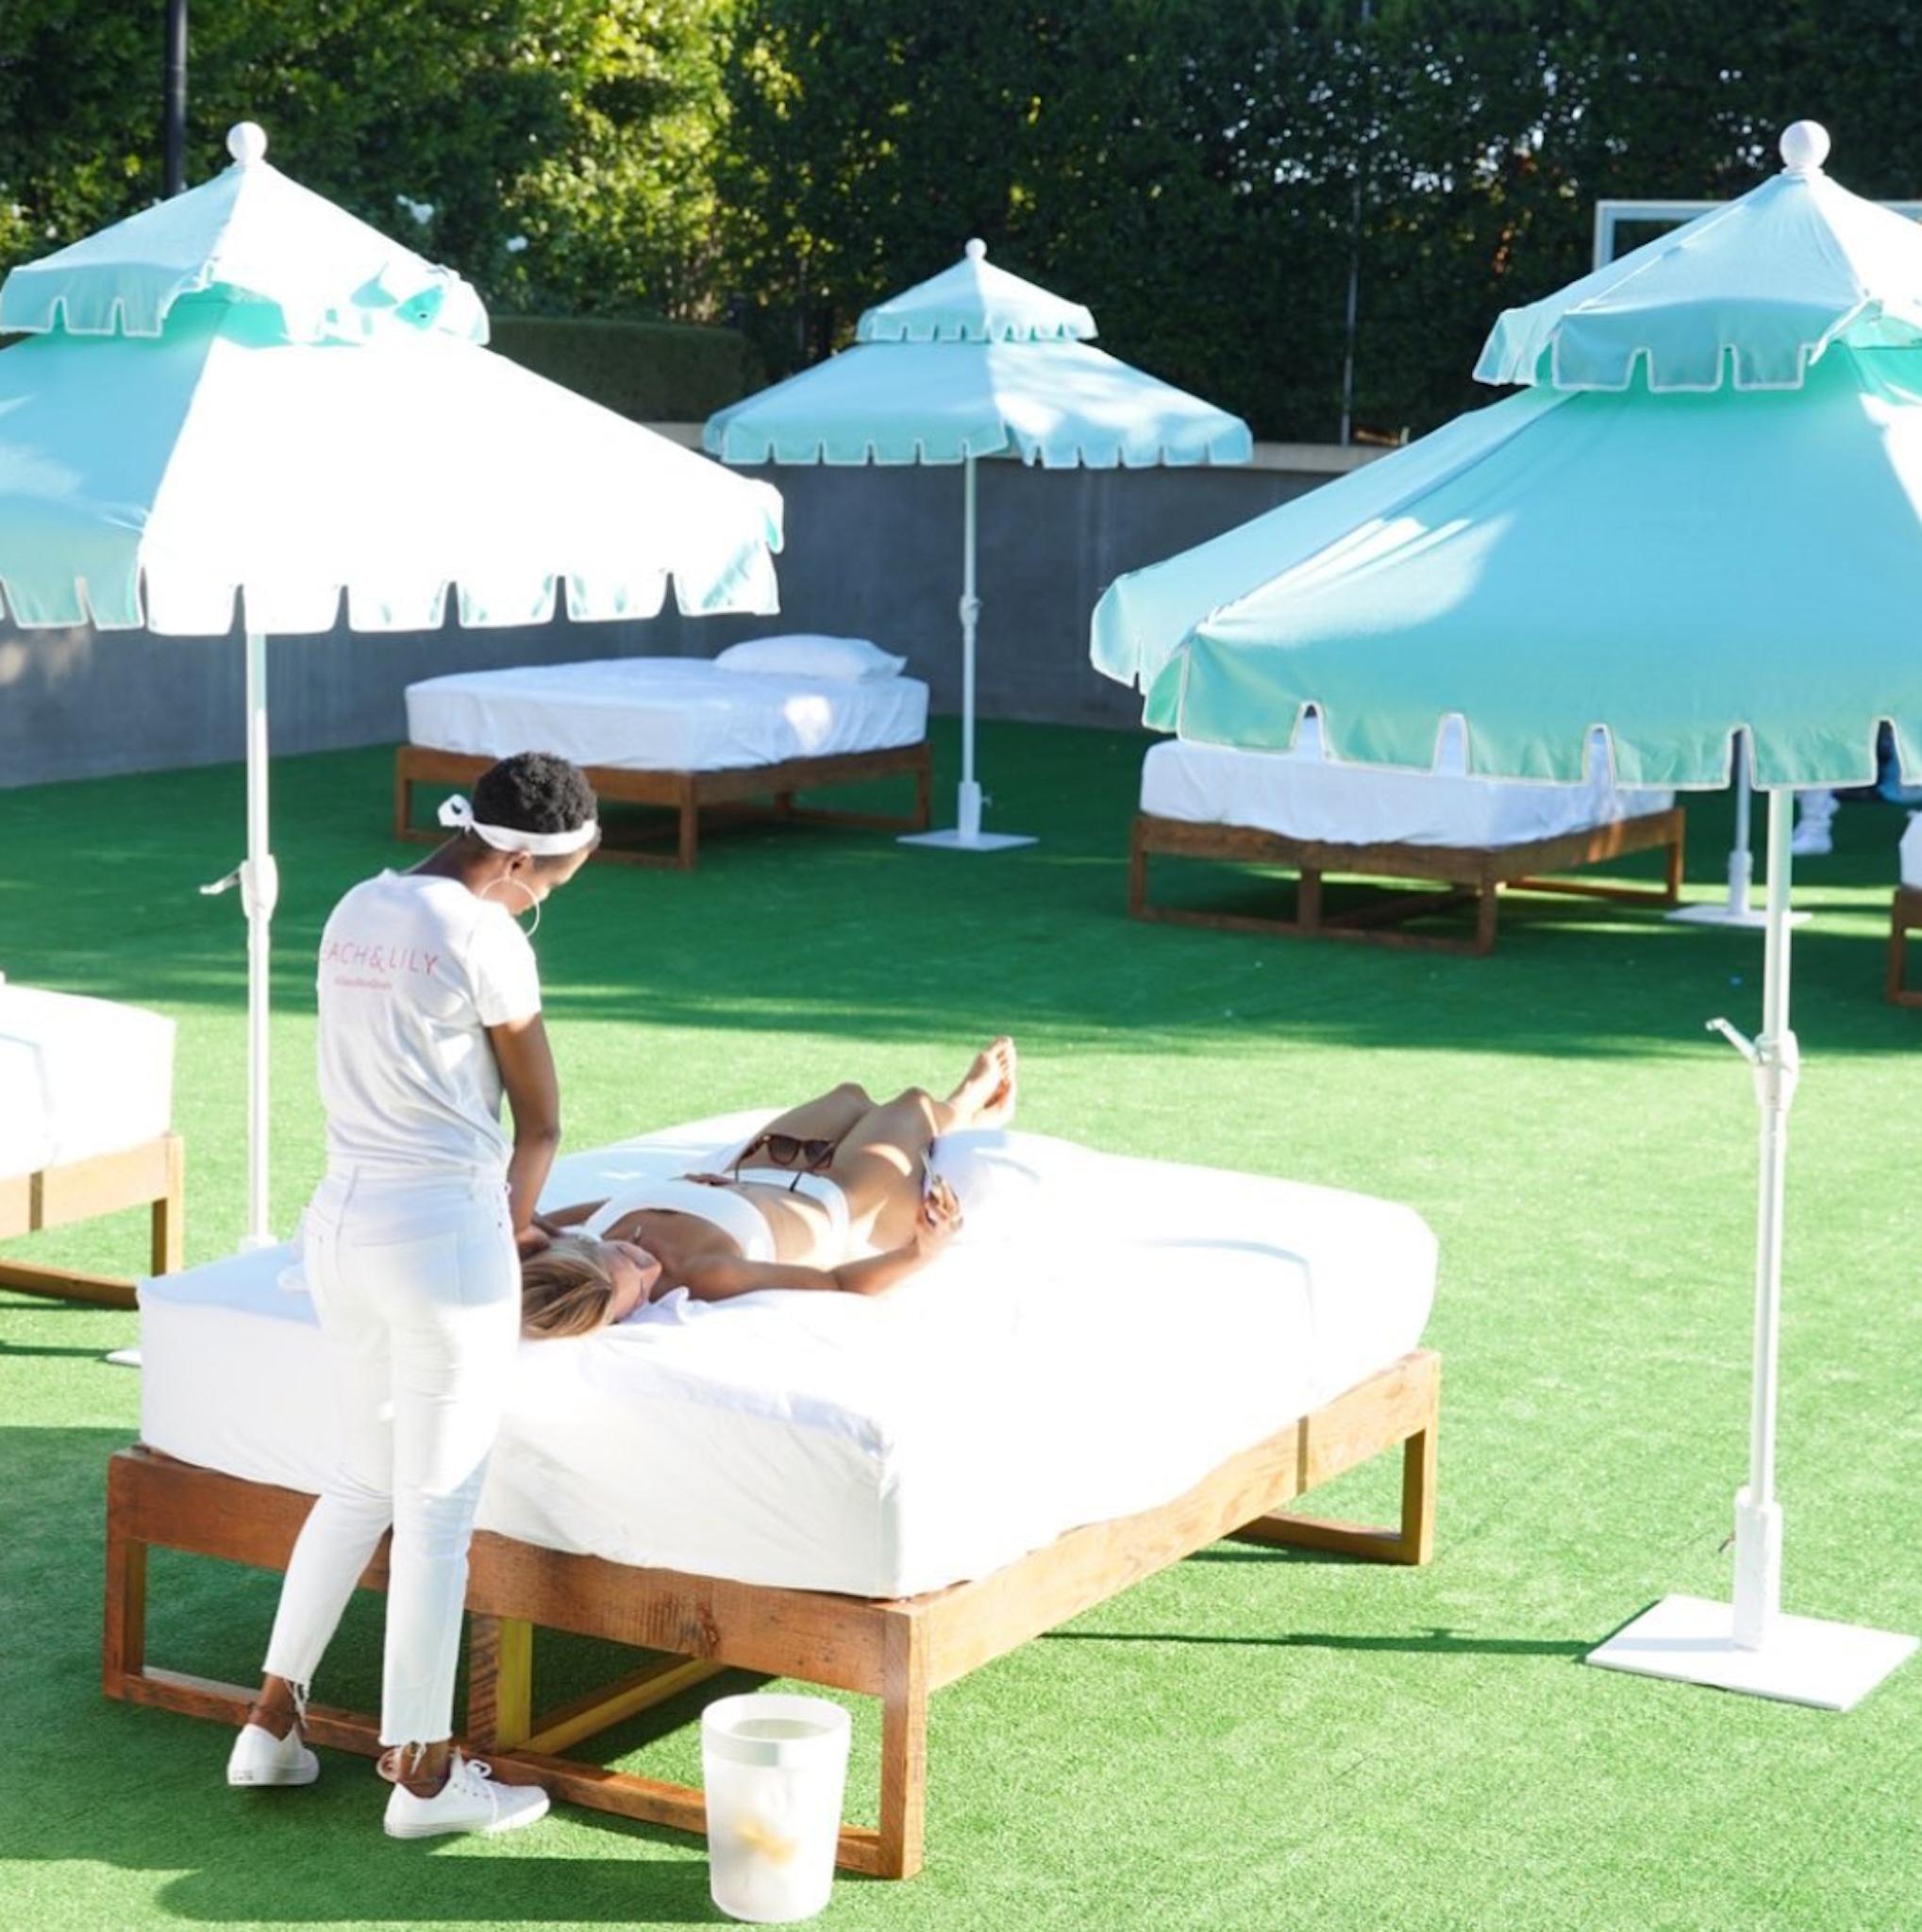 Kourtney Kardashian Poosh event massage tables on tennis court